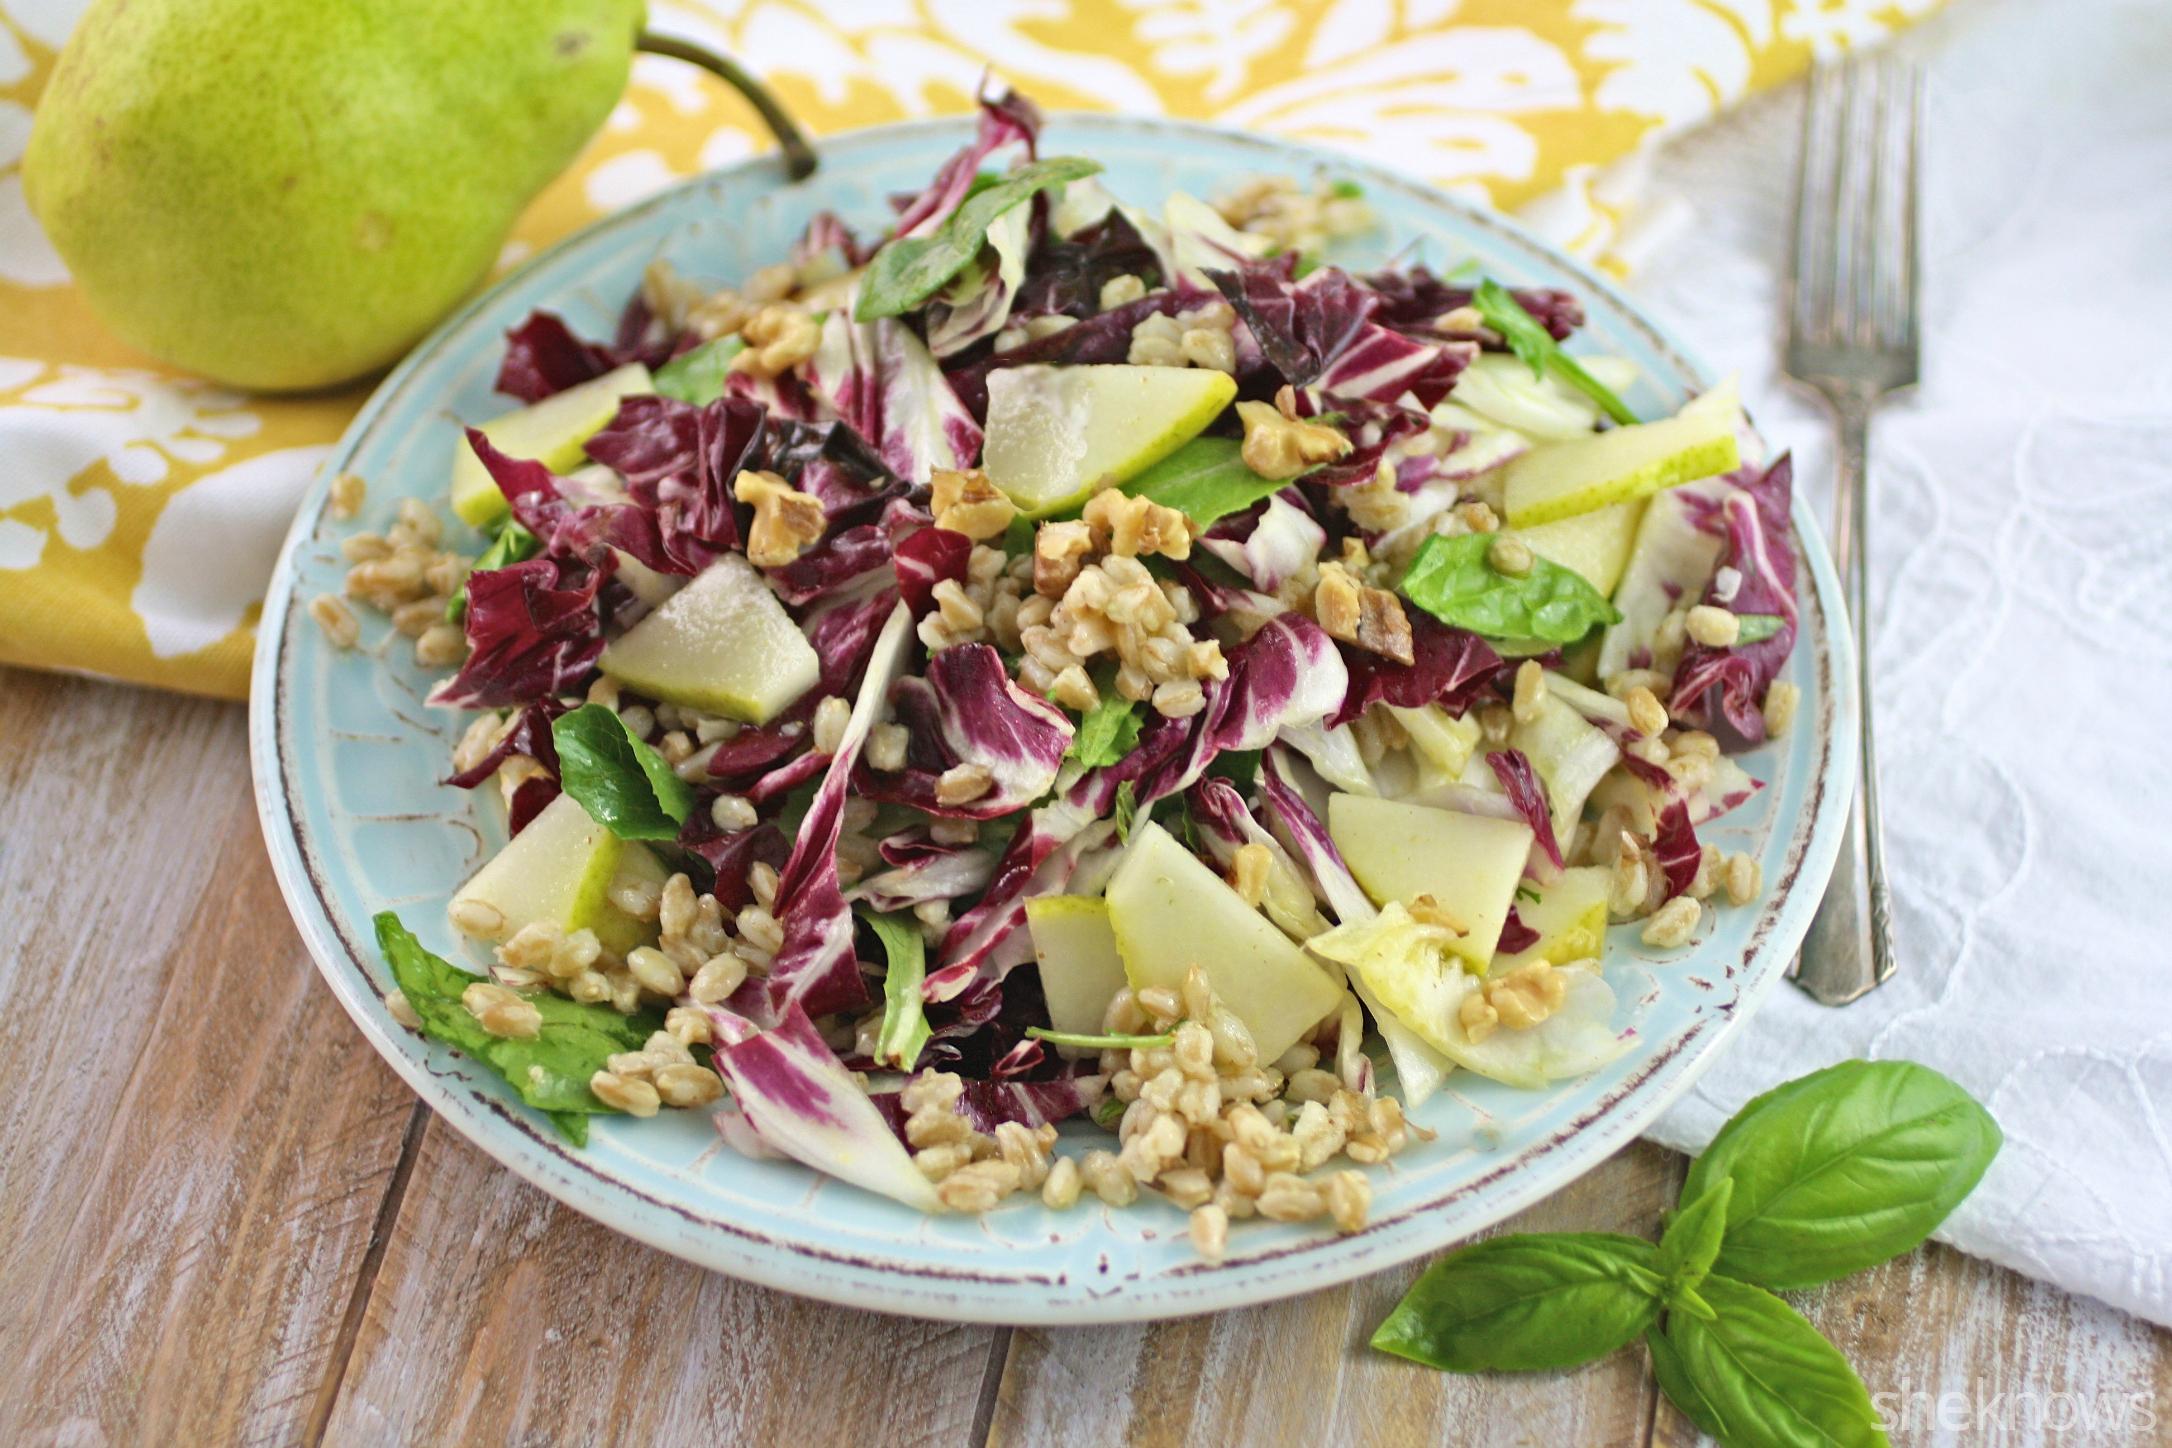 Take a seat for this farro, radicchio, and pear salad with lemon-basil vinaigrette